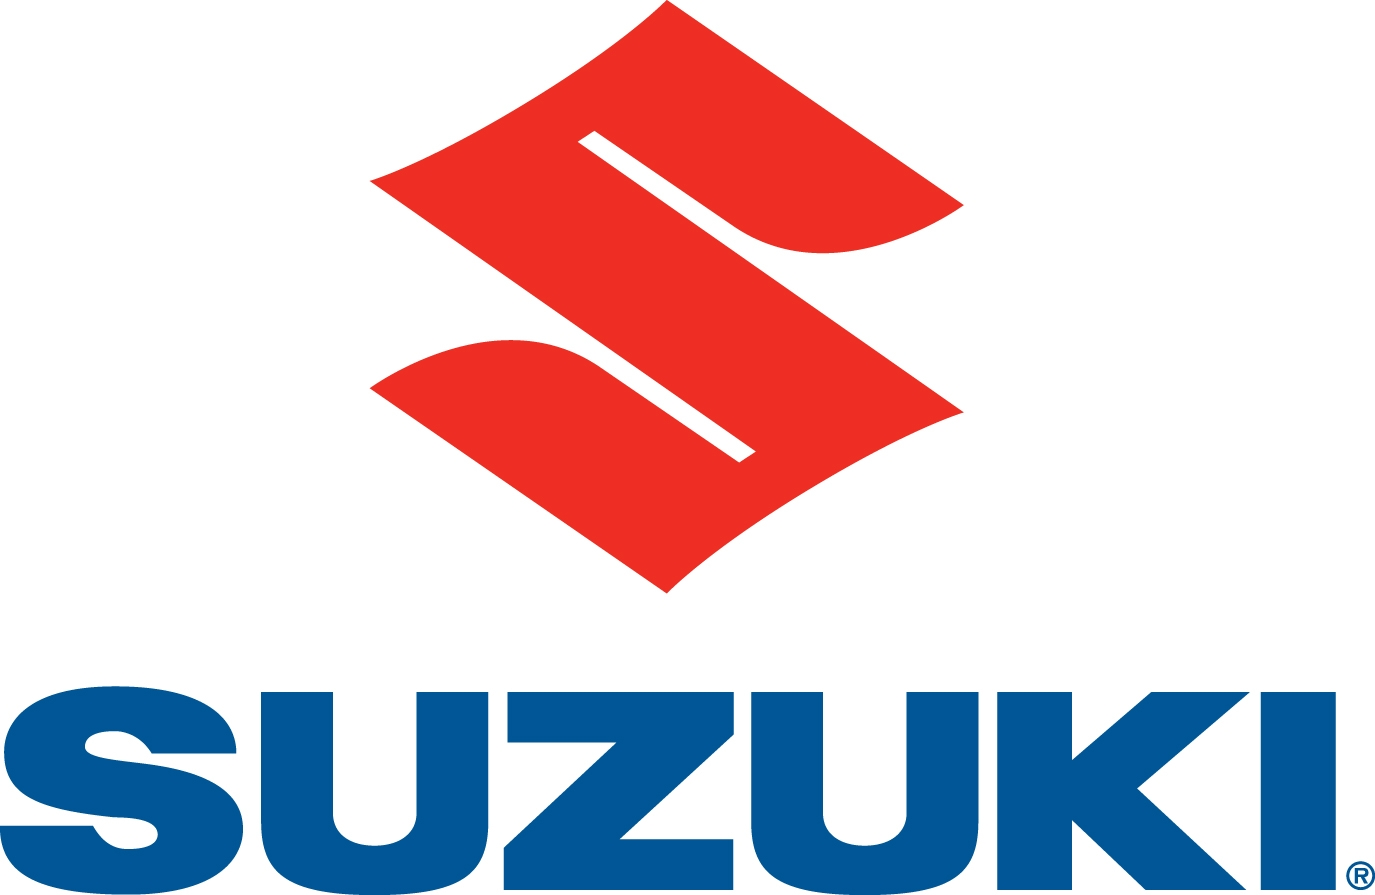 Piese OEM Suzuki pe comanda